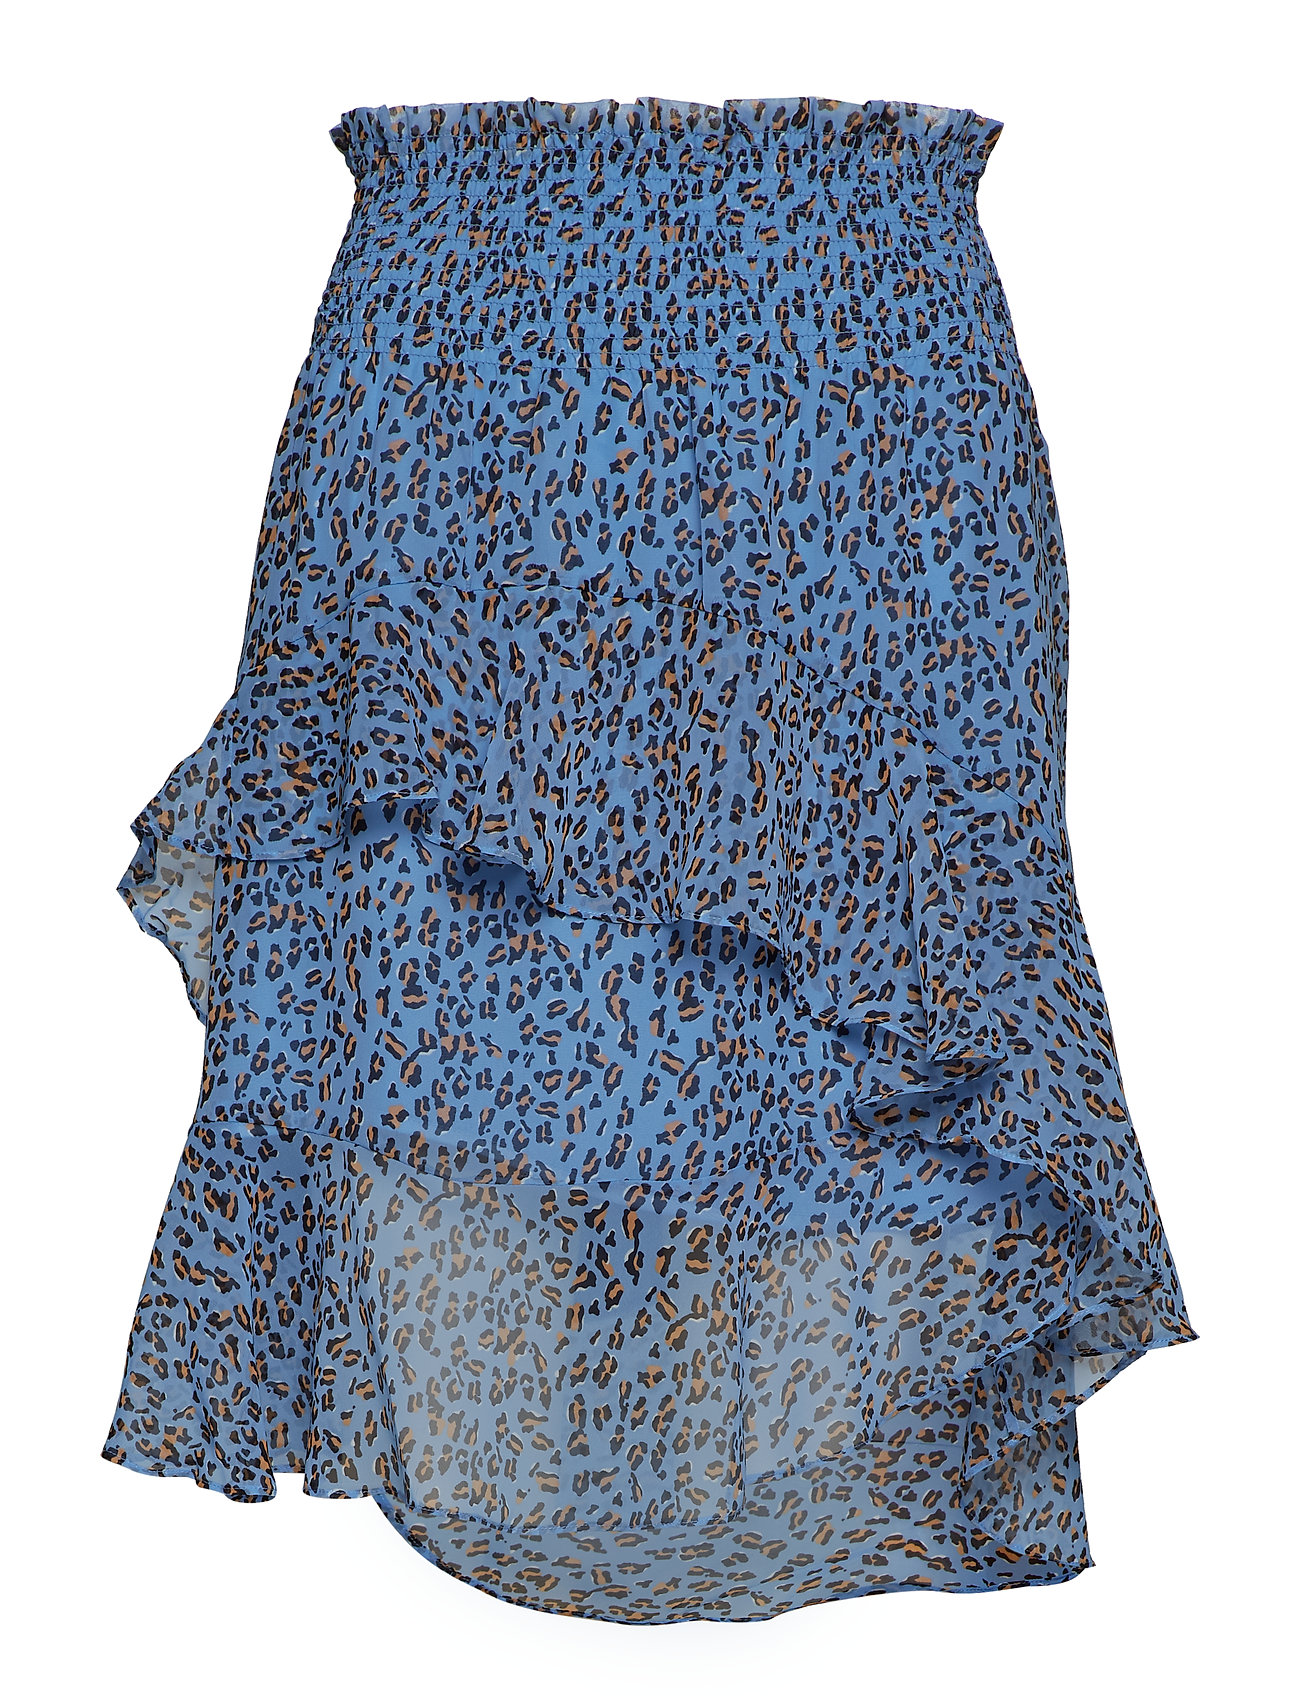 Munthe ANCHOR - BLUE